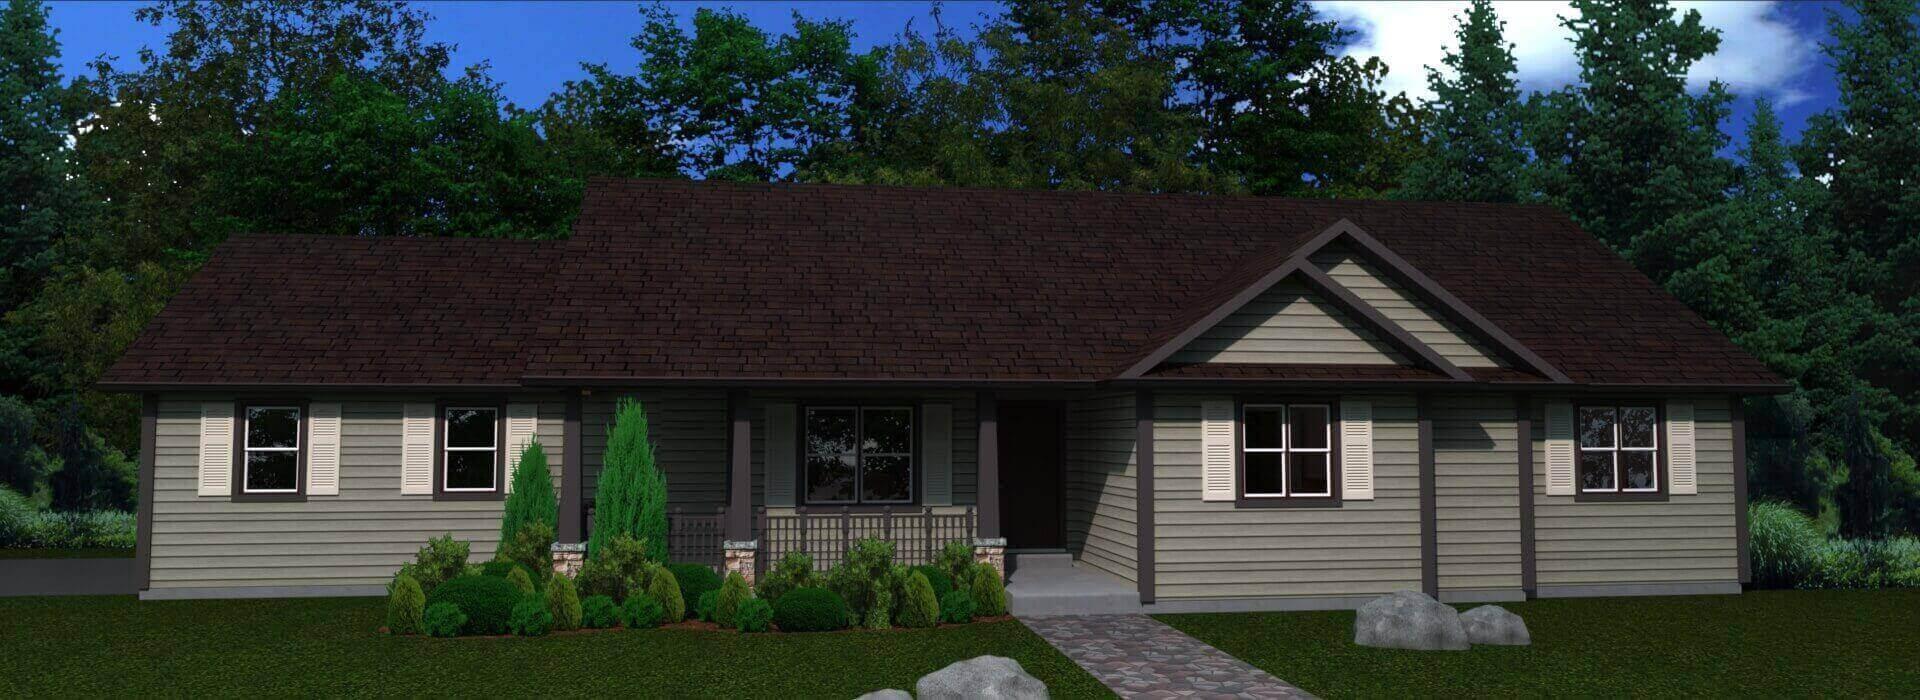 1523e_house elevation